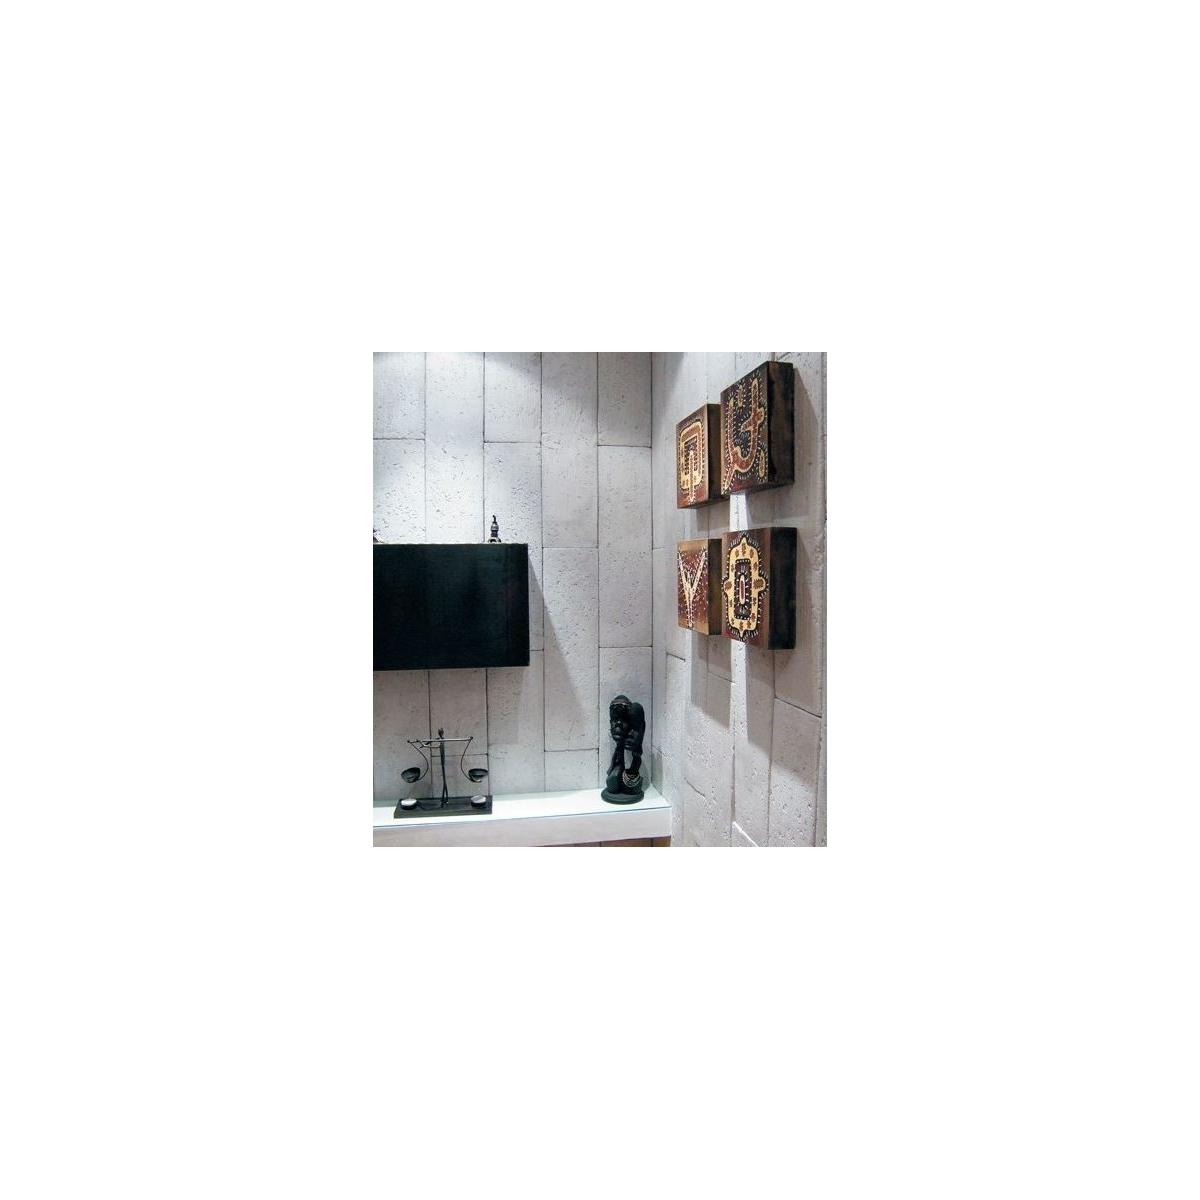 Plaqueta R61 Nueva York (Caja 1,1m2) - Revestimiento con Plaquetas de yeso - Marca Revesti-Mur